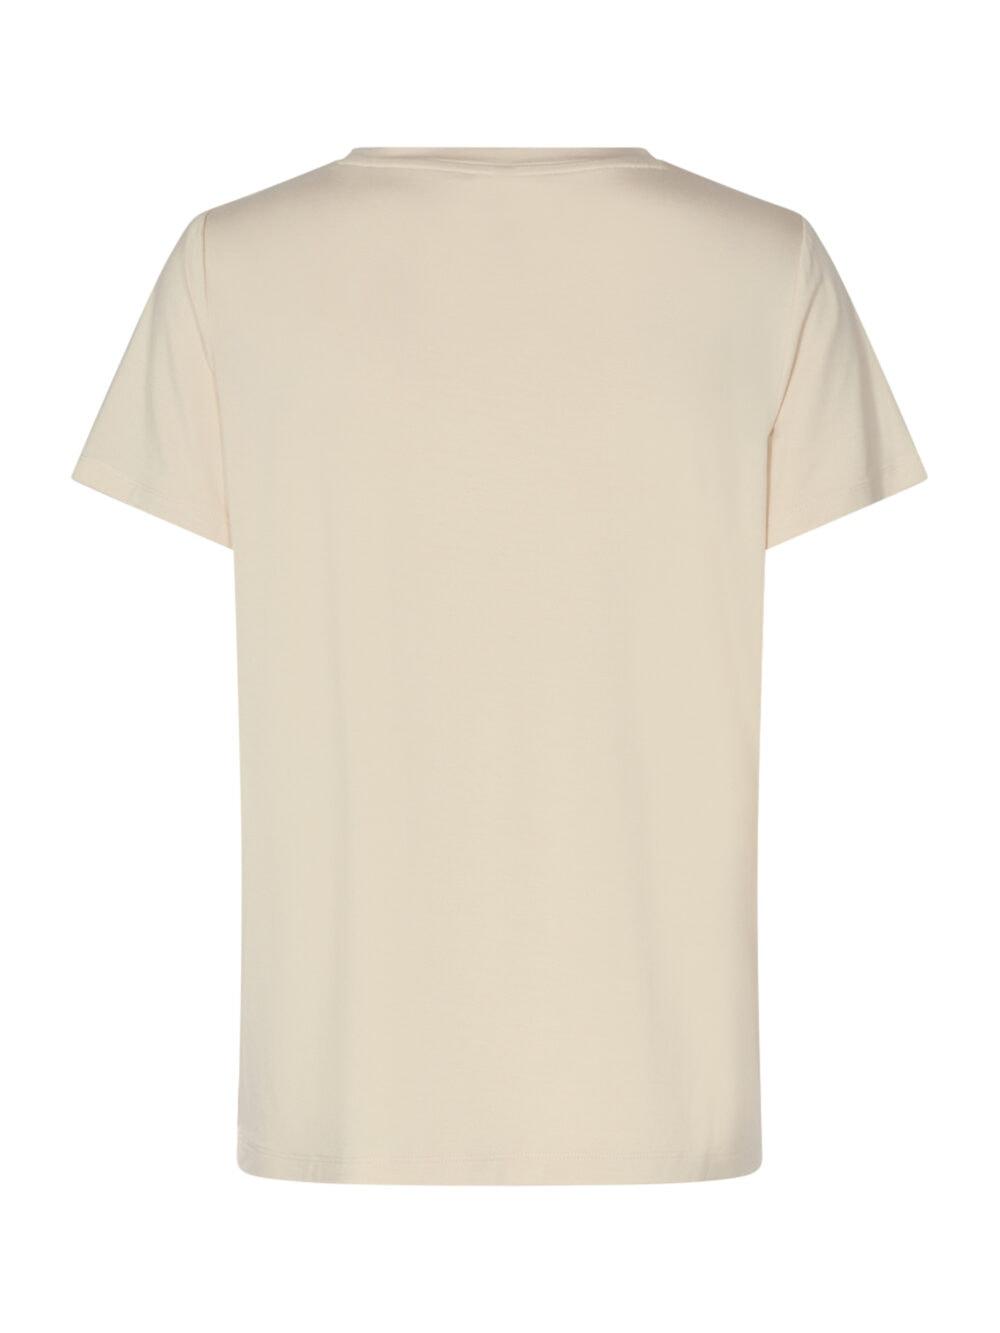 Soyaconcept Marica FP 156 T-shirt Hvid